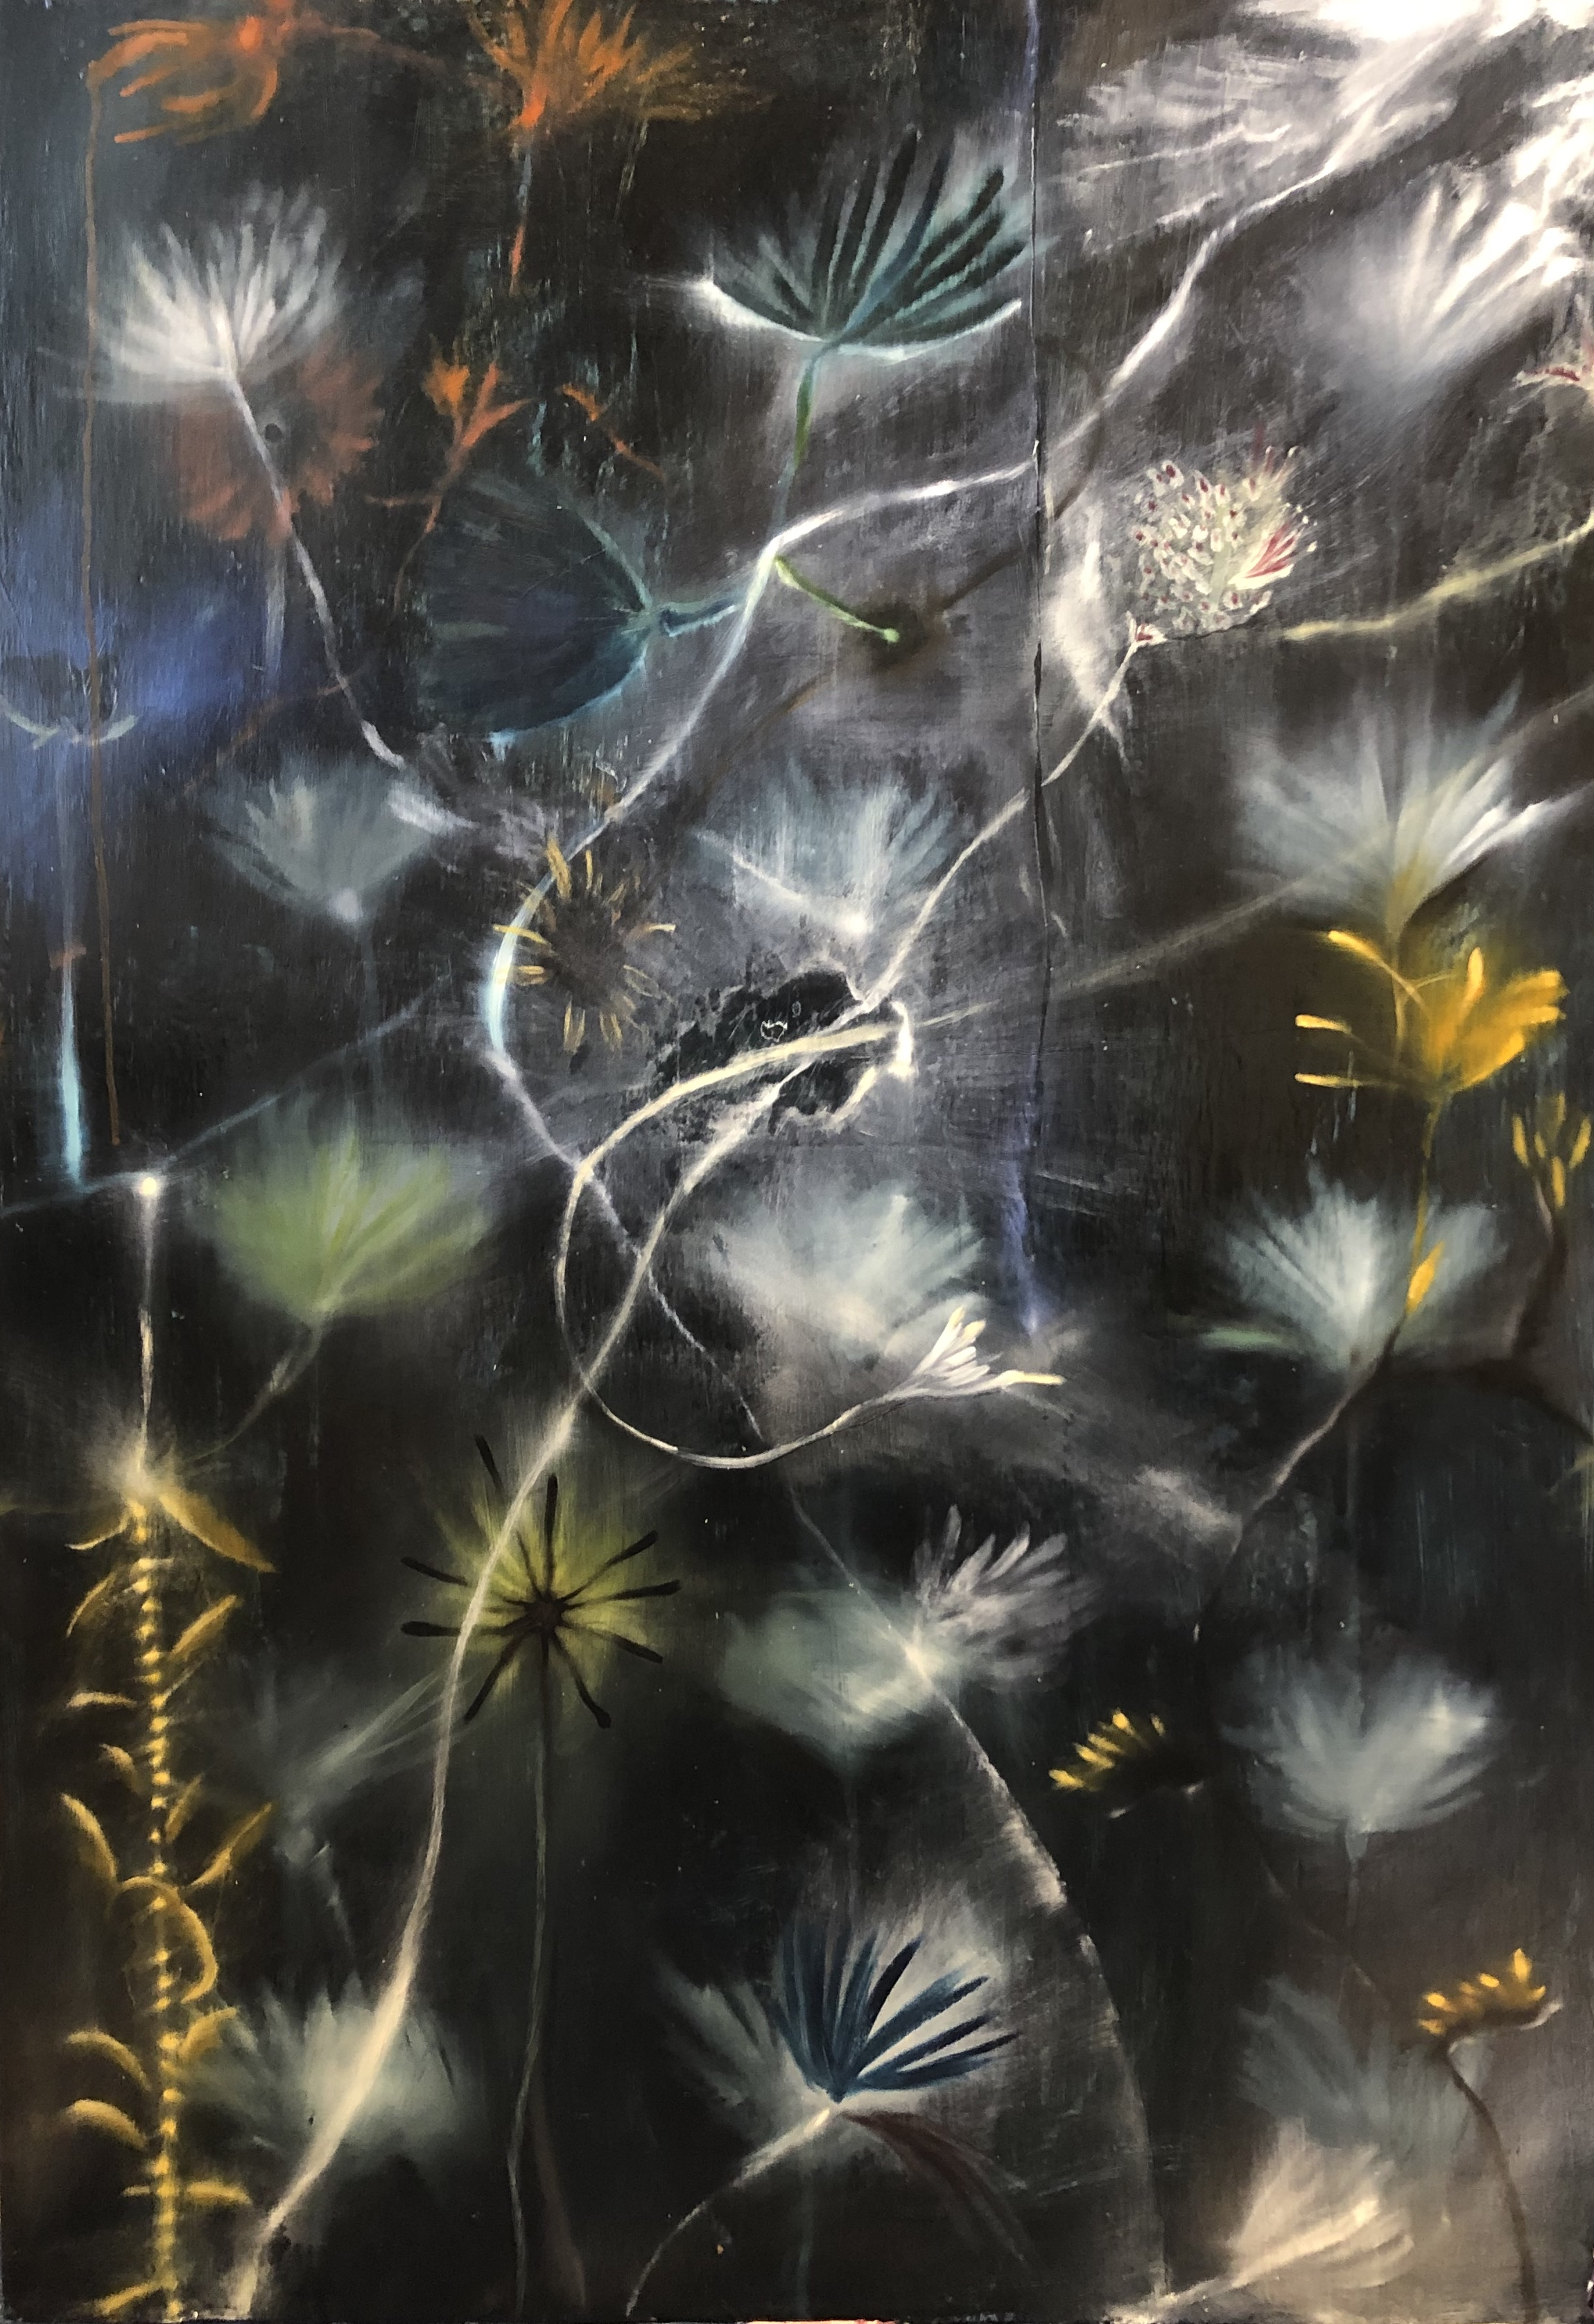 Flowers #2 (at night), 148 x 103 CM, 2019